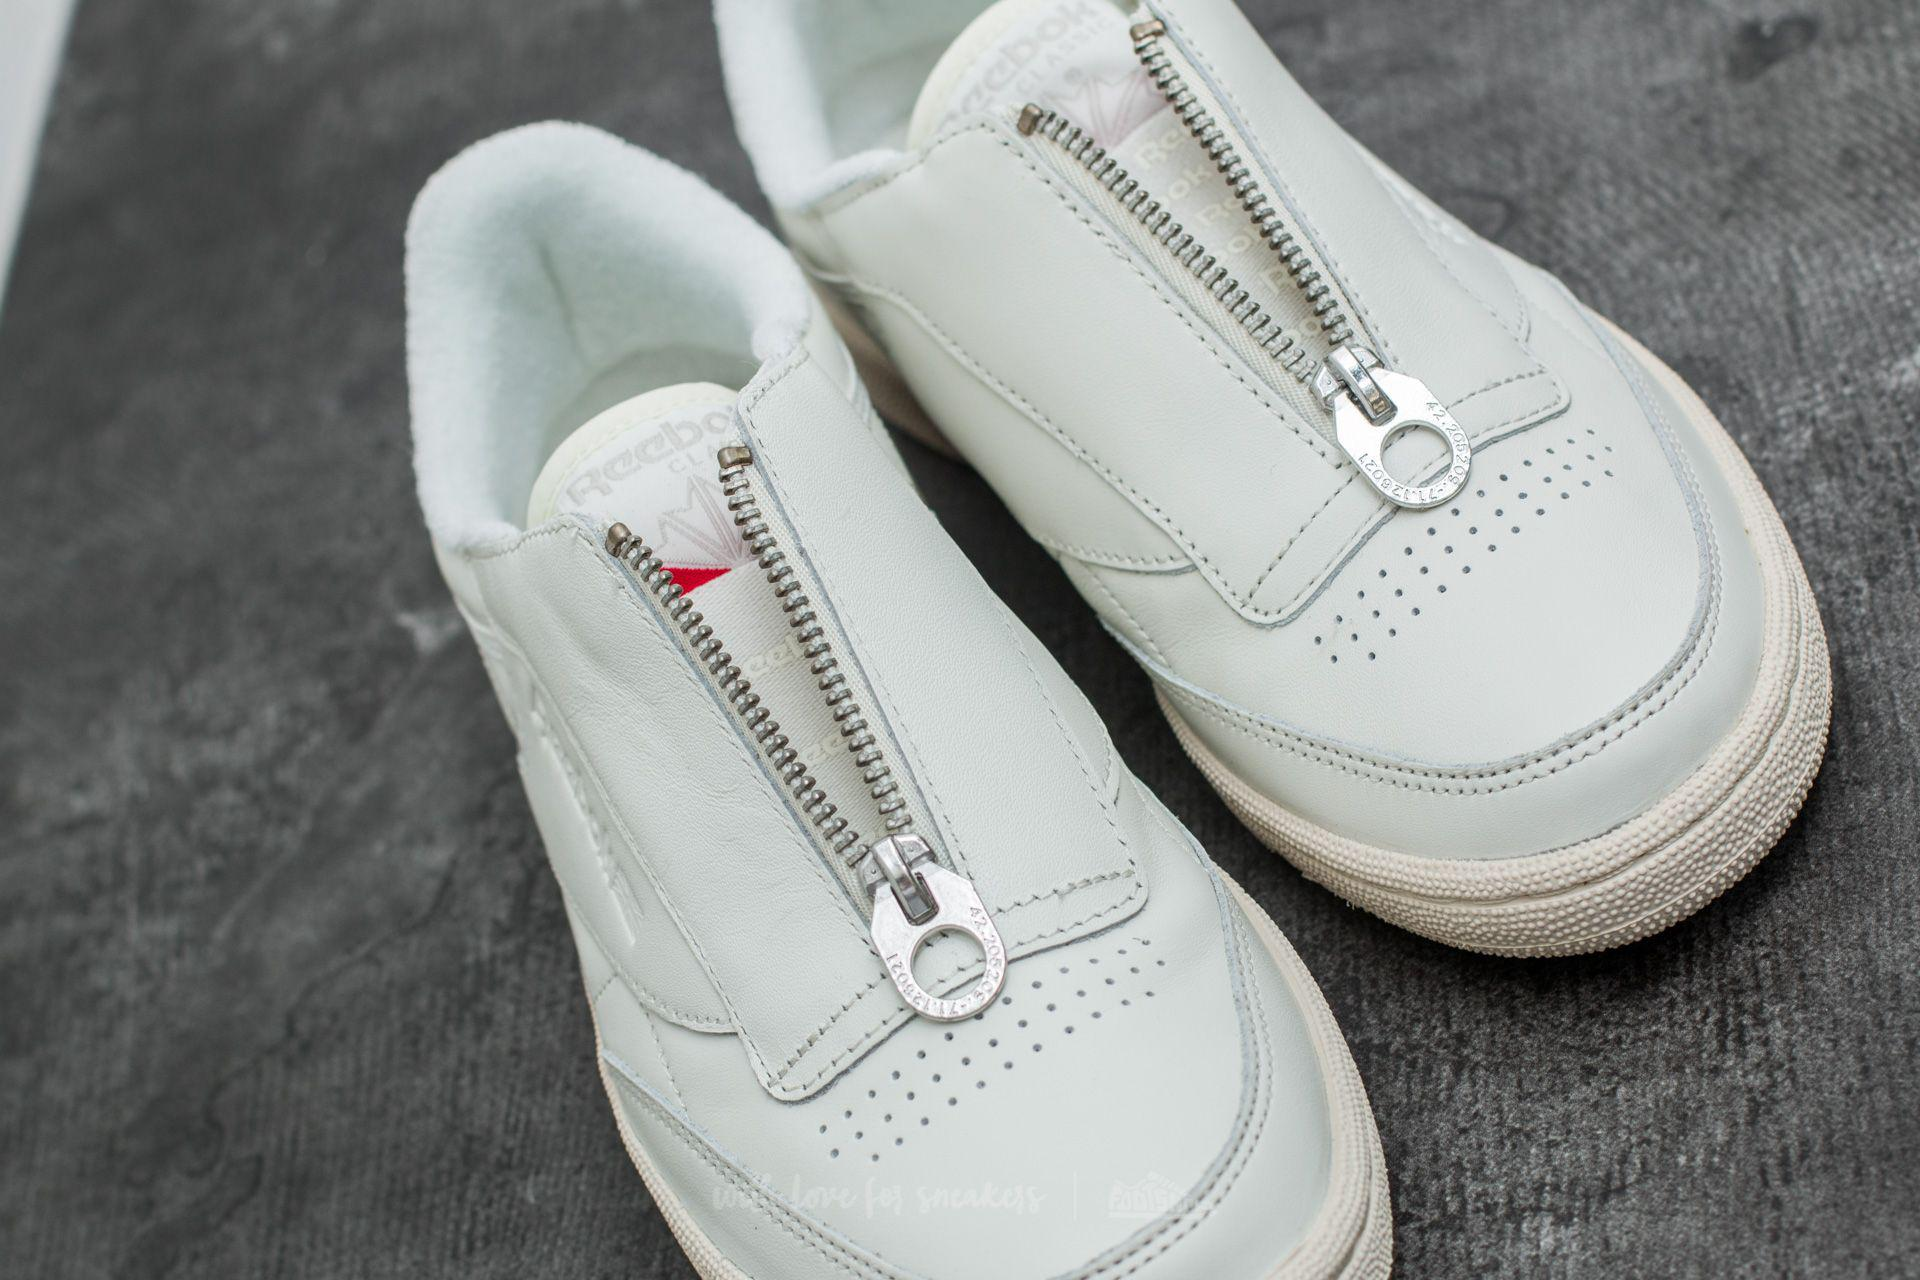 ec84e41dcaad Lyst - Reebok Club C 85 Zip Chalk  Sandstone  White  Silver